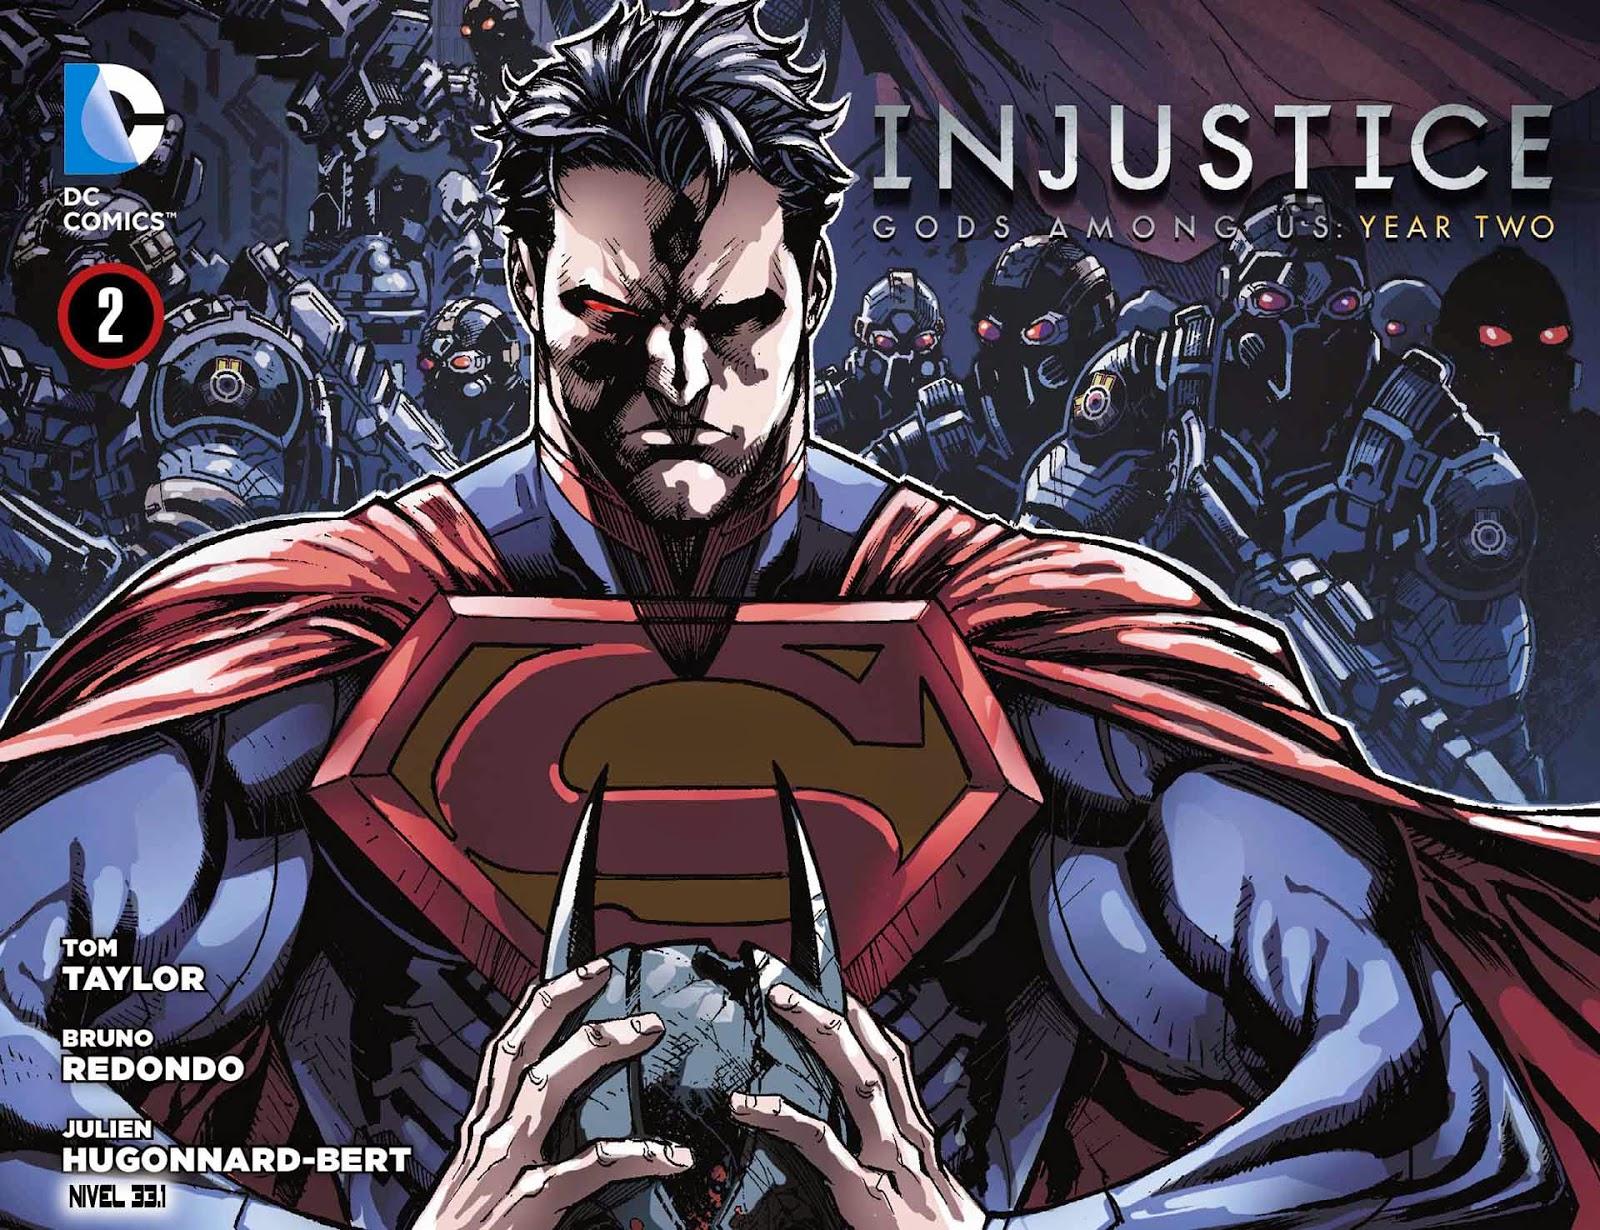 http://www.mediafire.com/download/6dko27z4hli7x29/Injustice+2_2.cbr